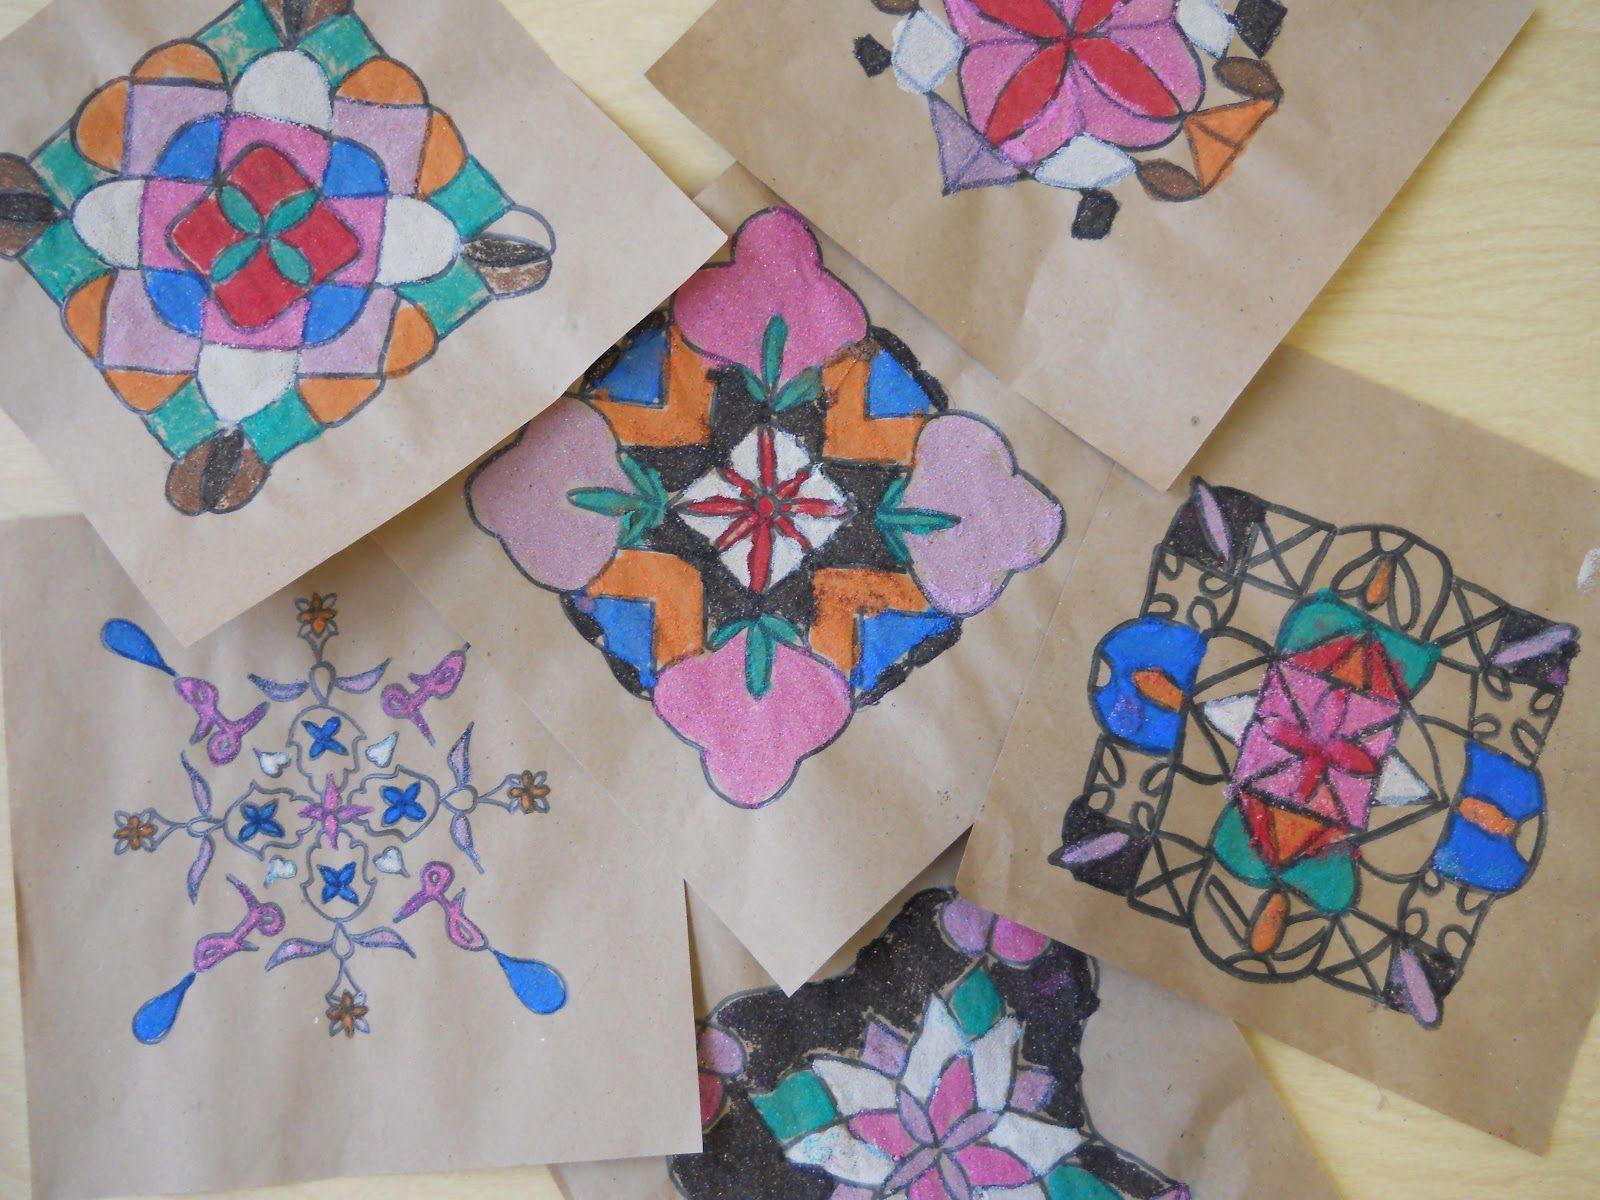 Rangoli Designs from India Elementary art, Elementary